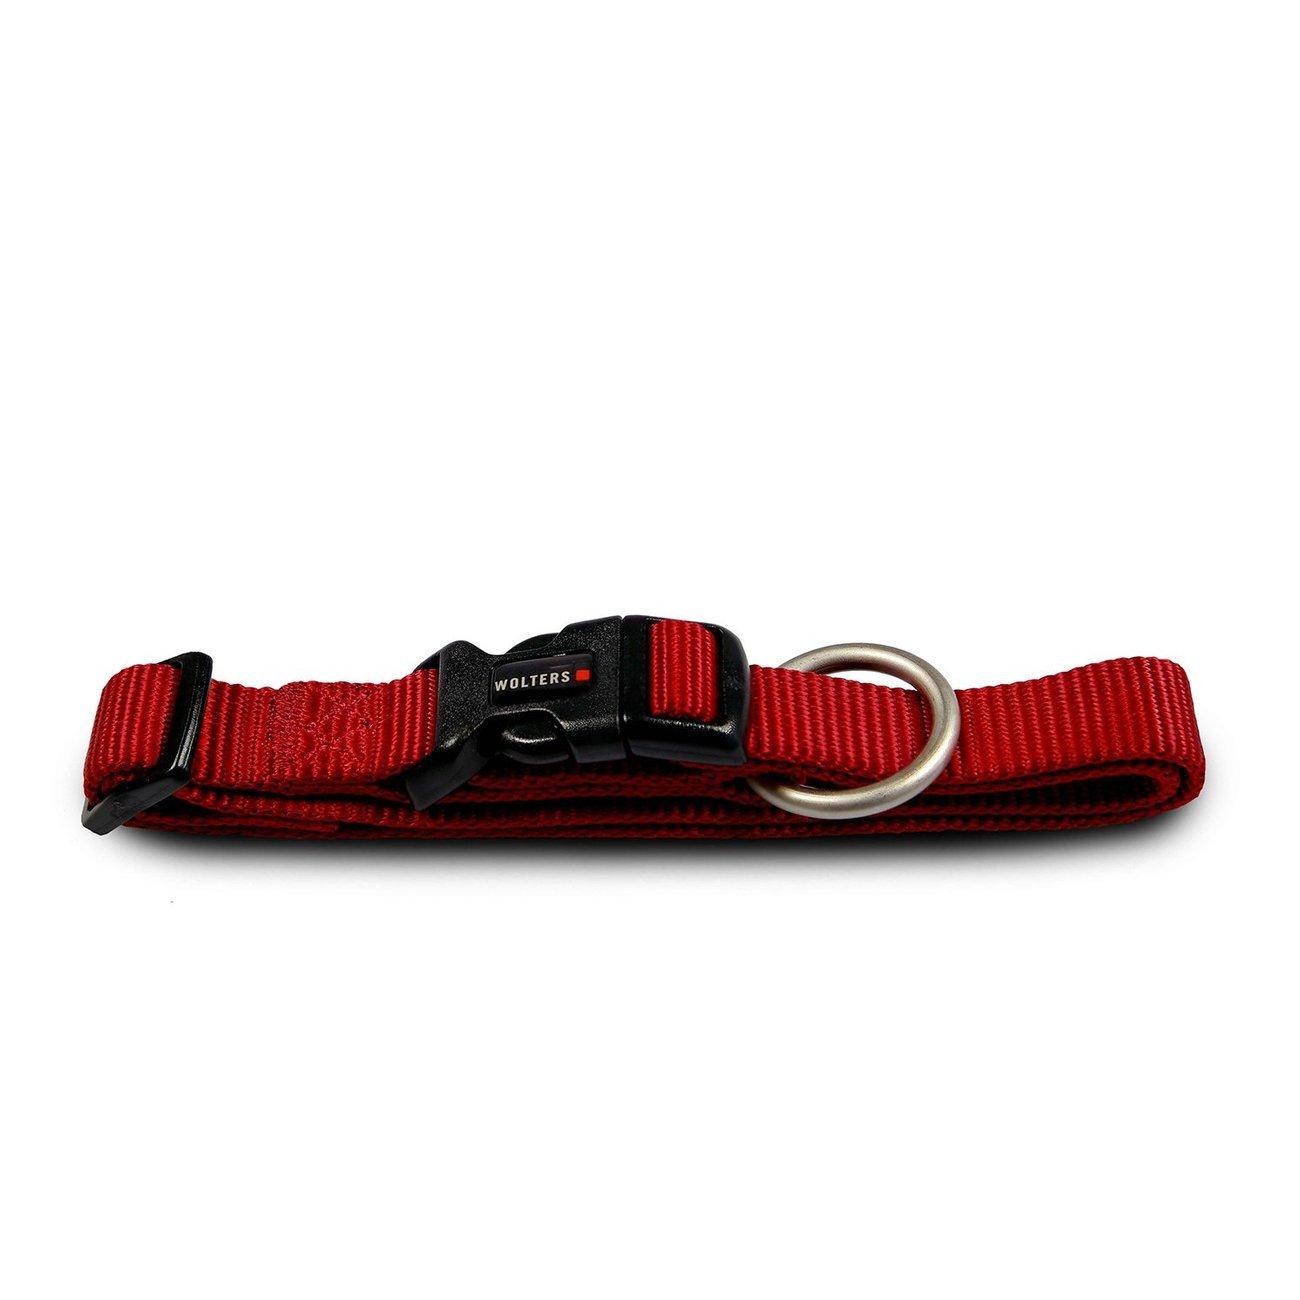 Wolters Halsband Nylon Professional, Bild 16